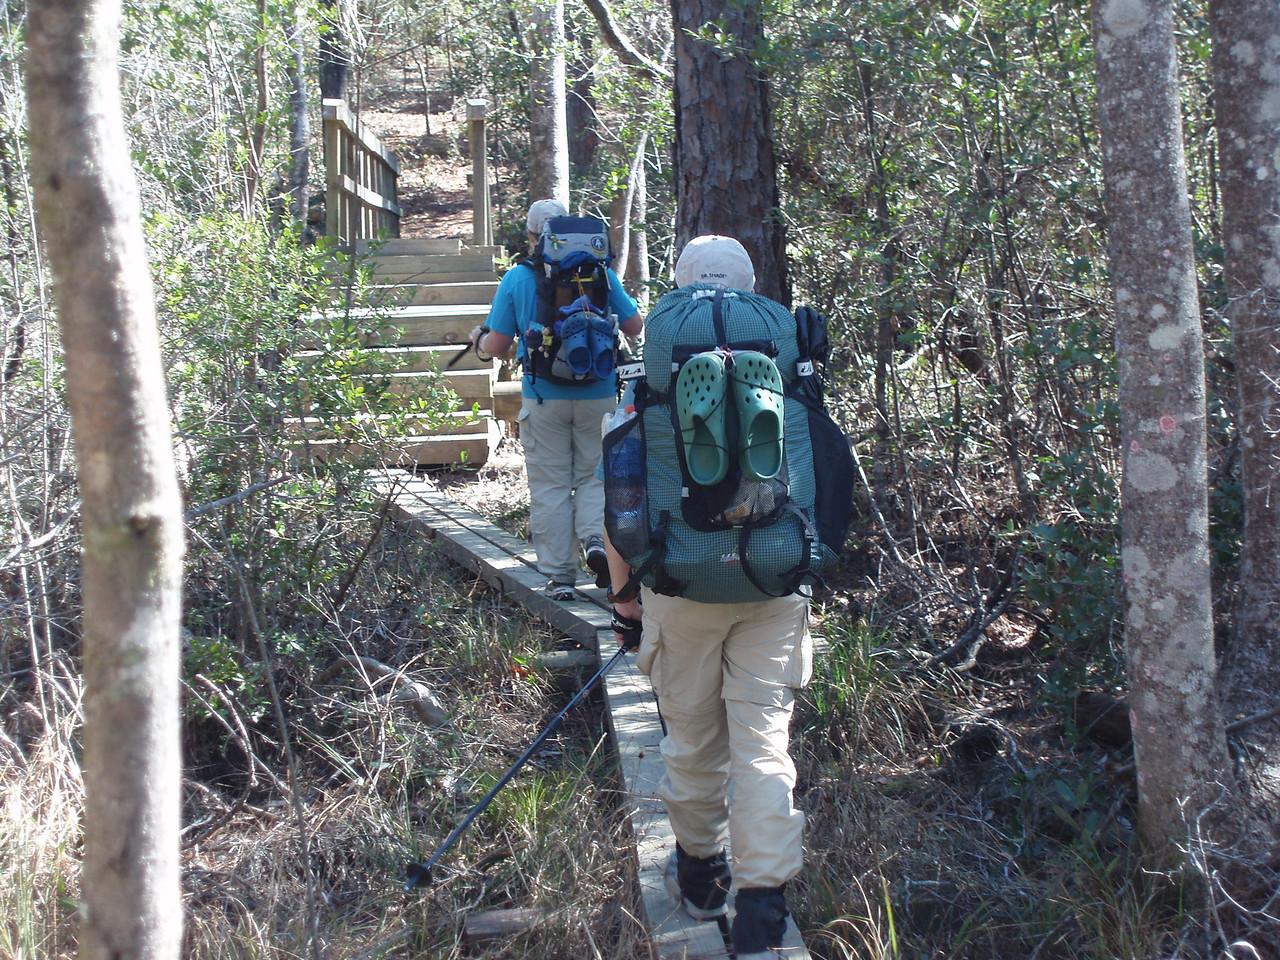 Backpackers crossing Eglin bridge<br /> PHOTO CREDIT: Robert Coveney / Florida Trail Association